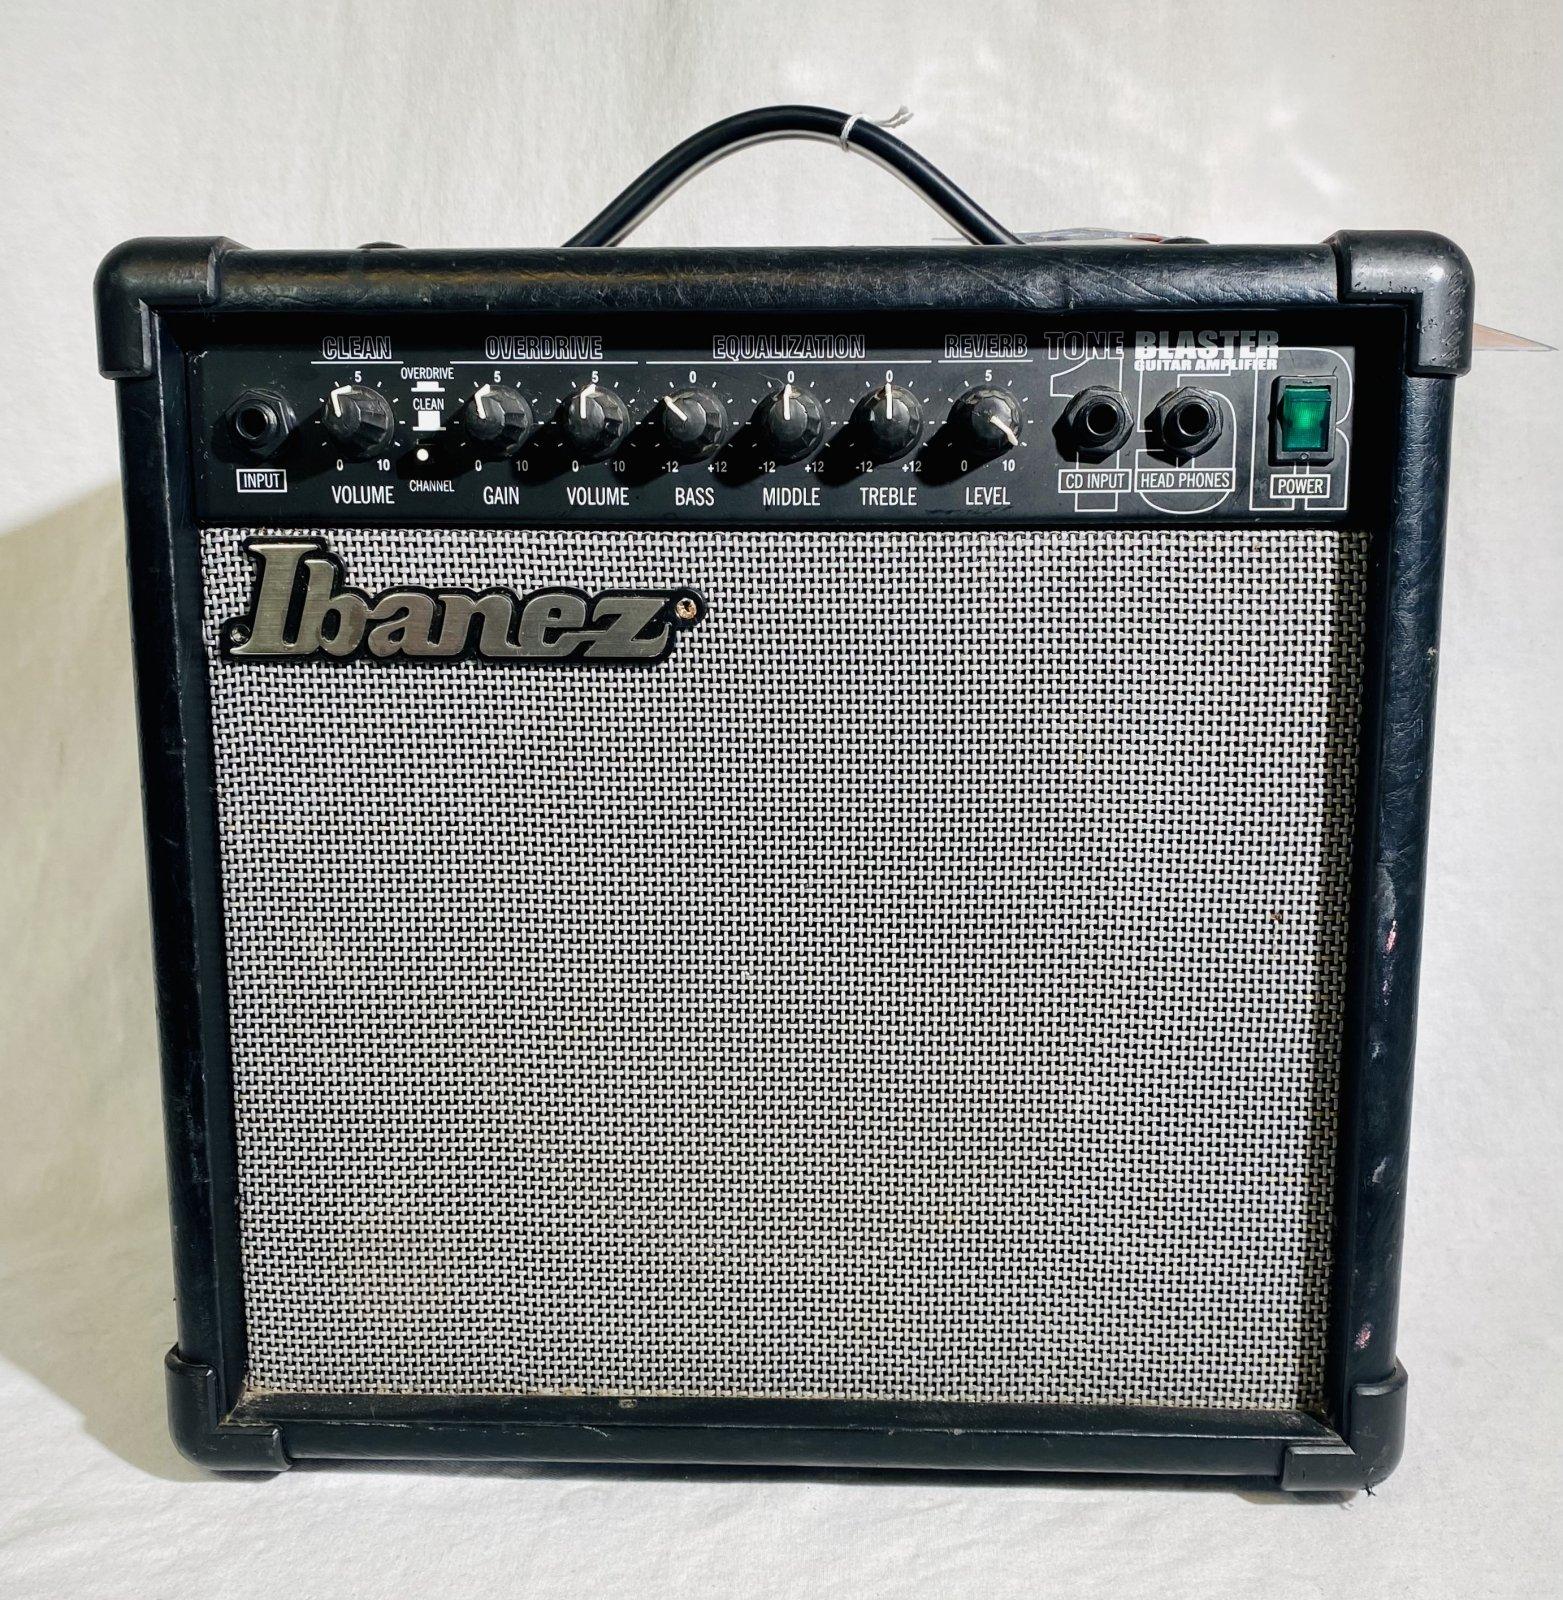 IBANEZ BLASTER TB15R COMBO GUITAR AMP